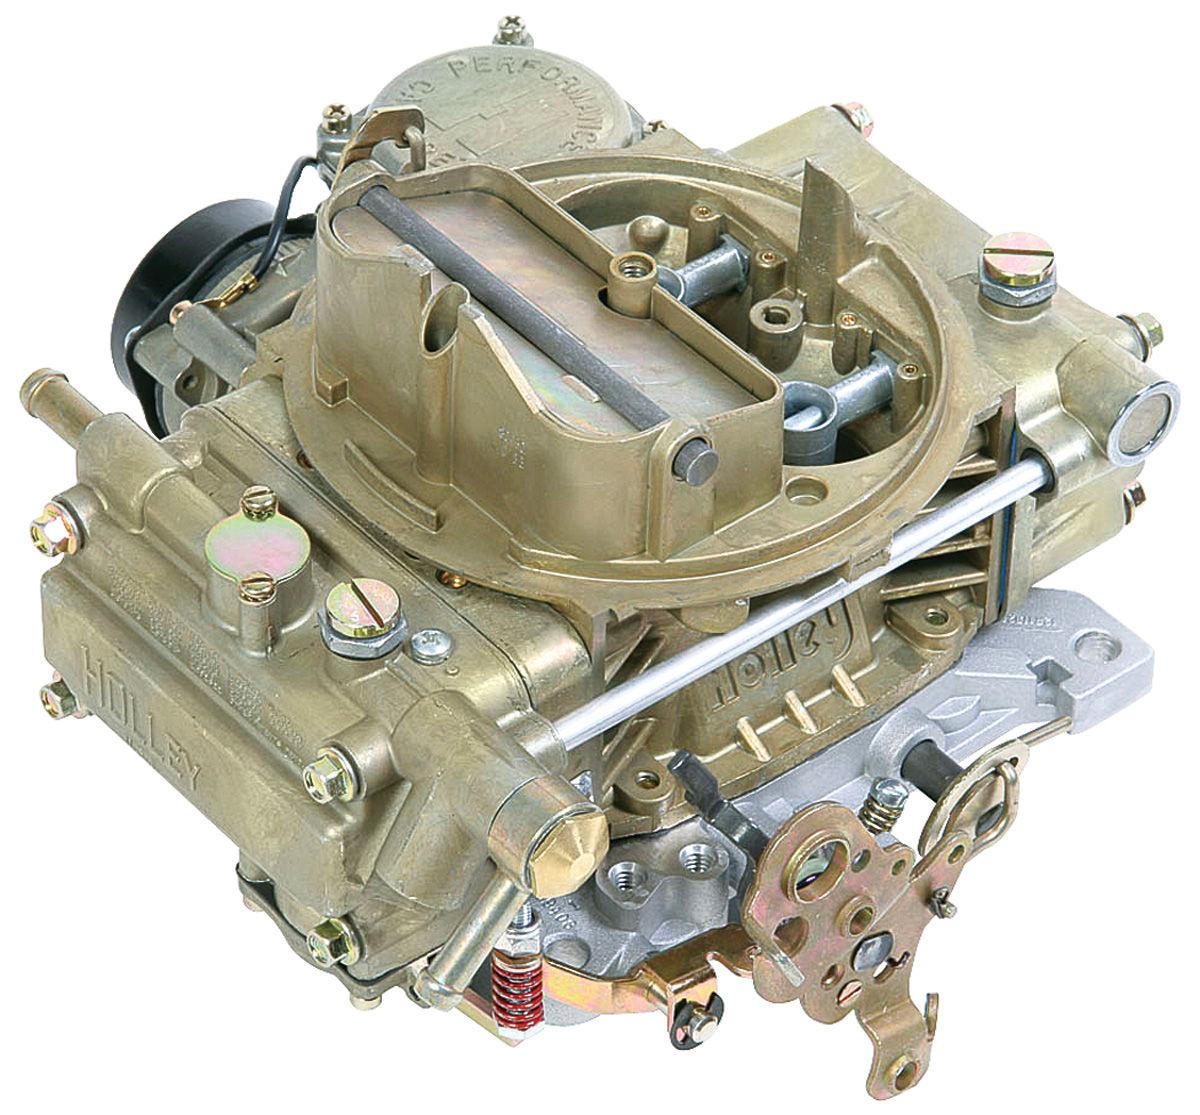 Carburetor, Holley, 600 CFM, 70-74 Factory Replacement